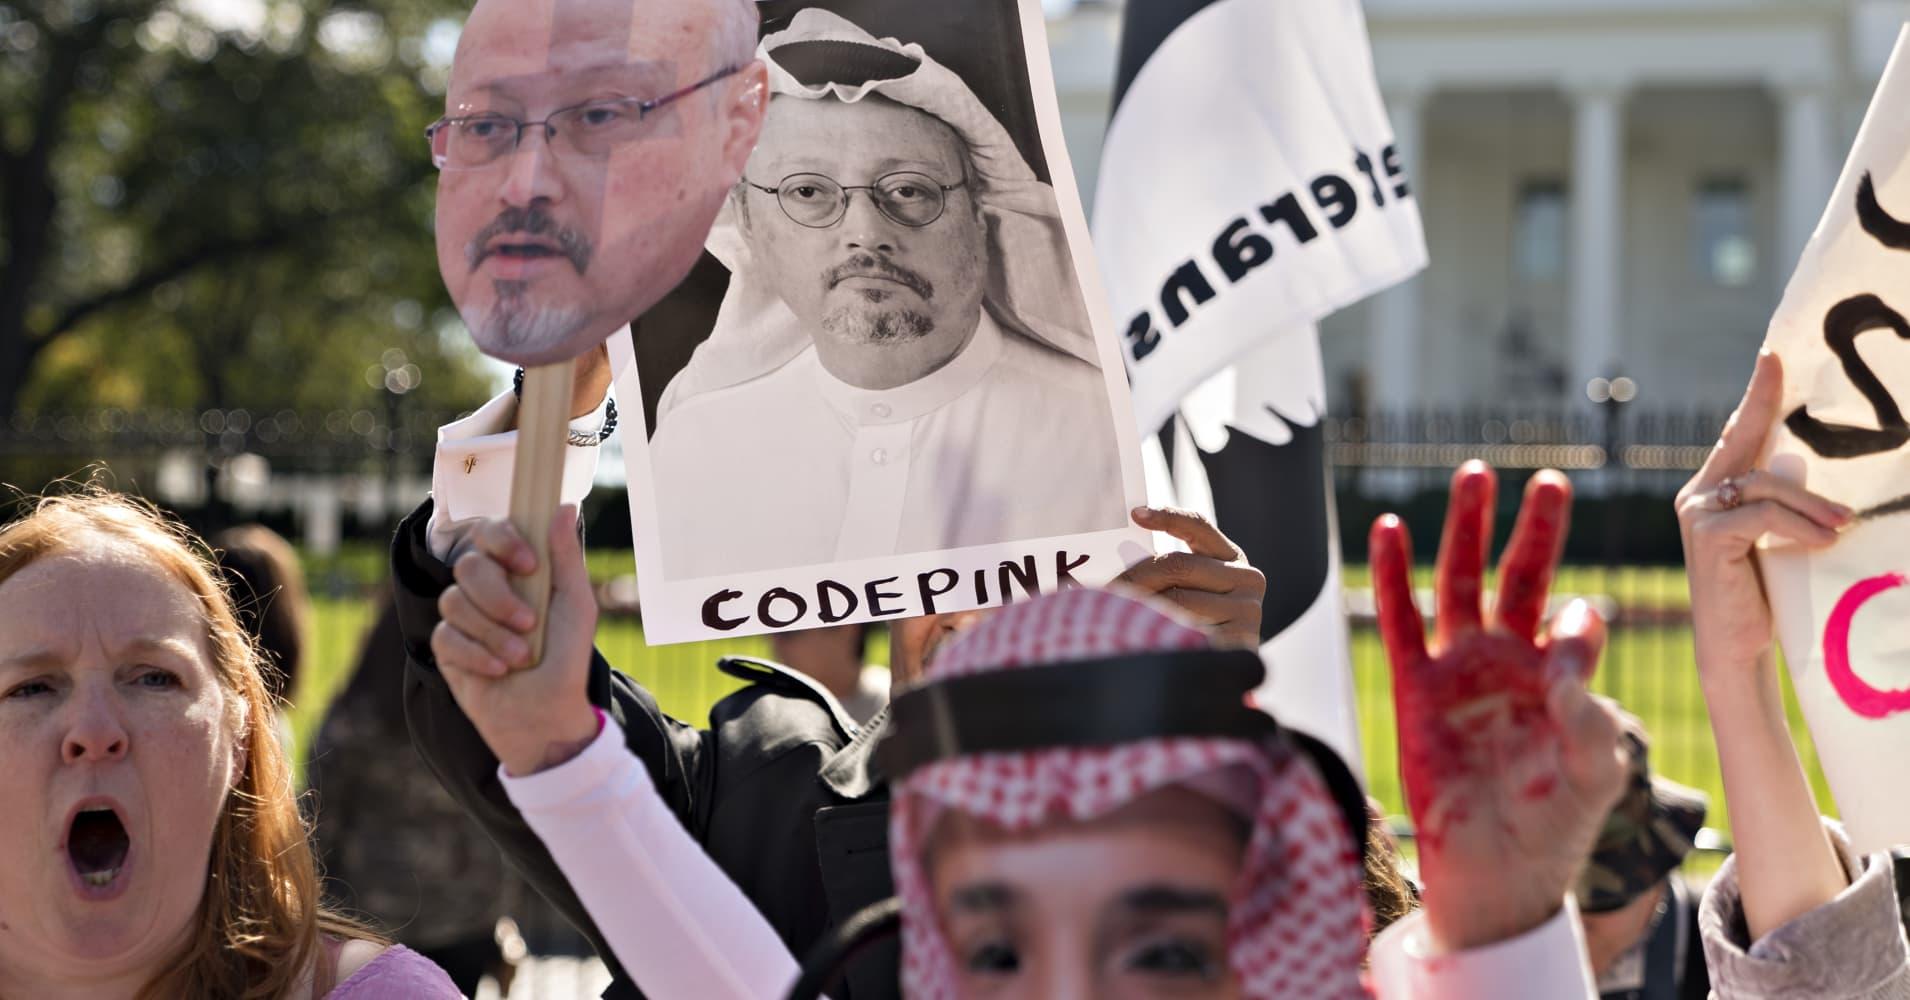 I would not invest in Saudi Arabia, says Egyptian billionaire Naguib Sawiris